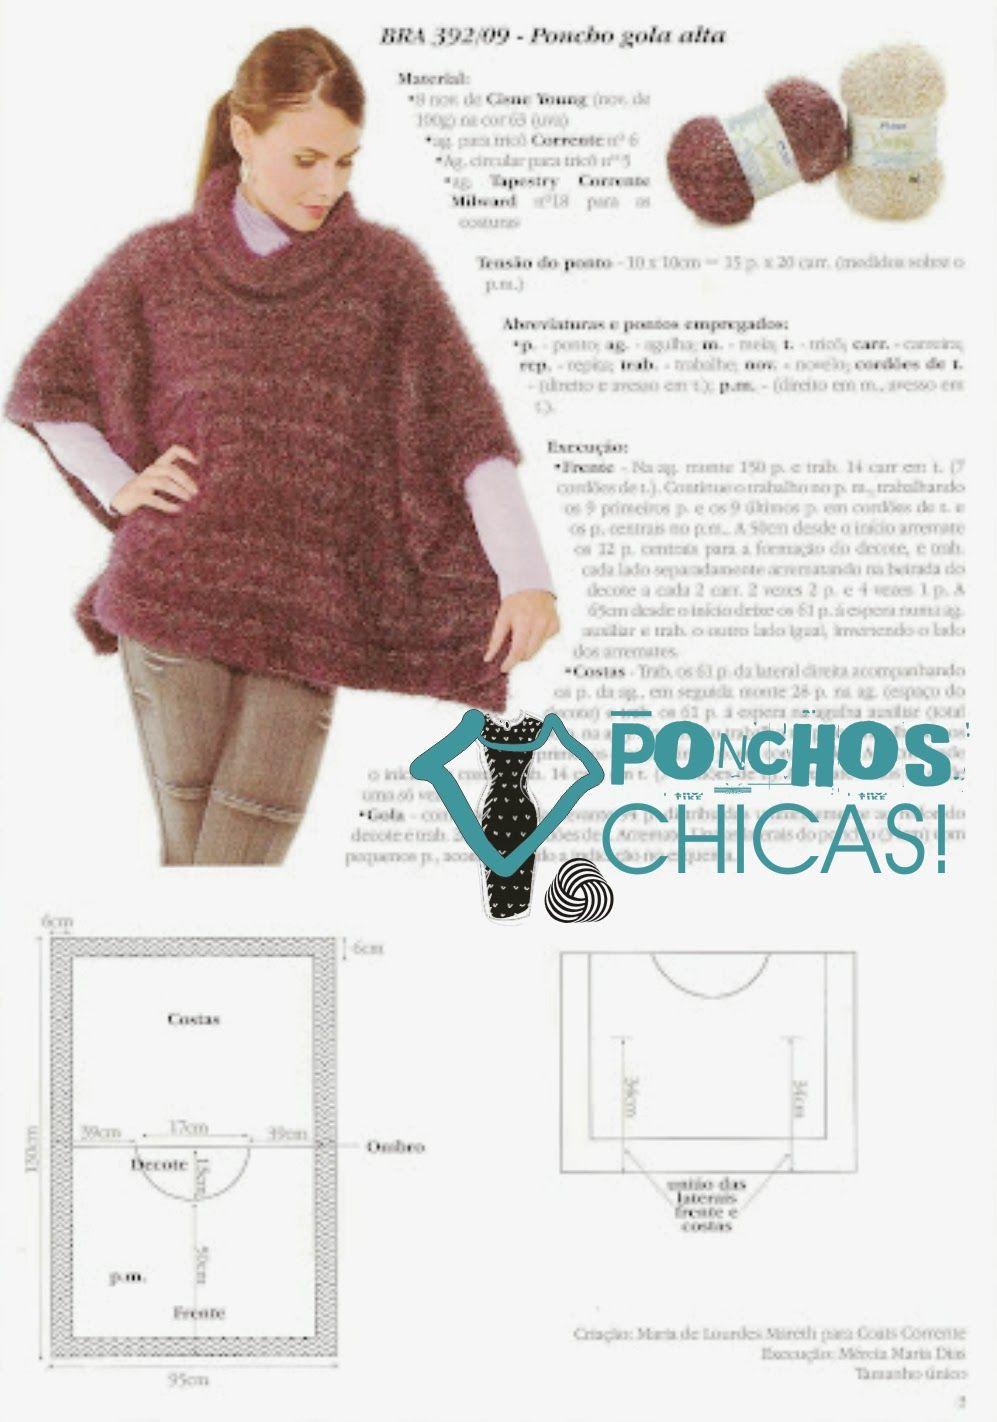 Pin de Leslie Guglielmo en Sew many seams | Pinterest | Ponchos, Dos ...